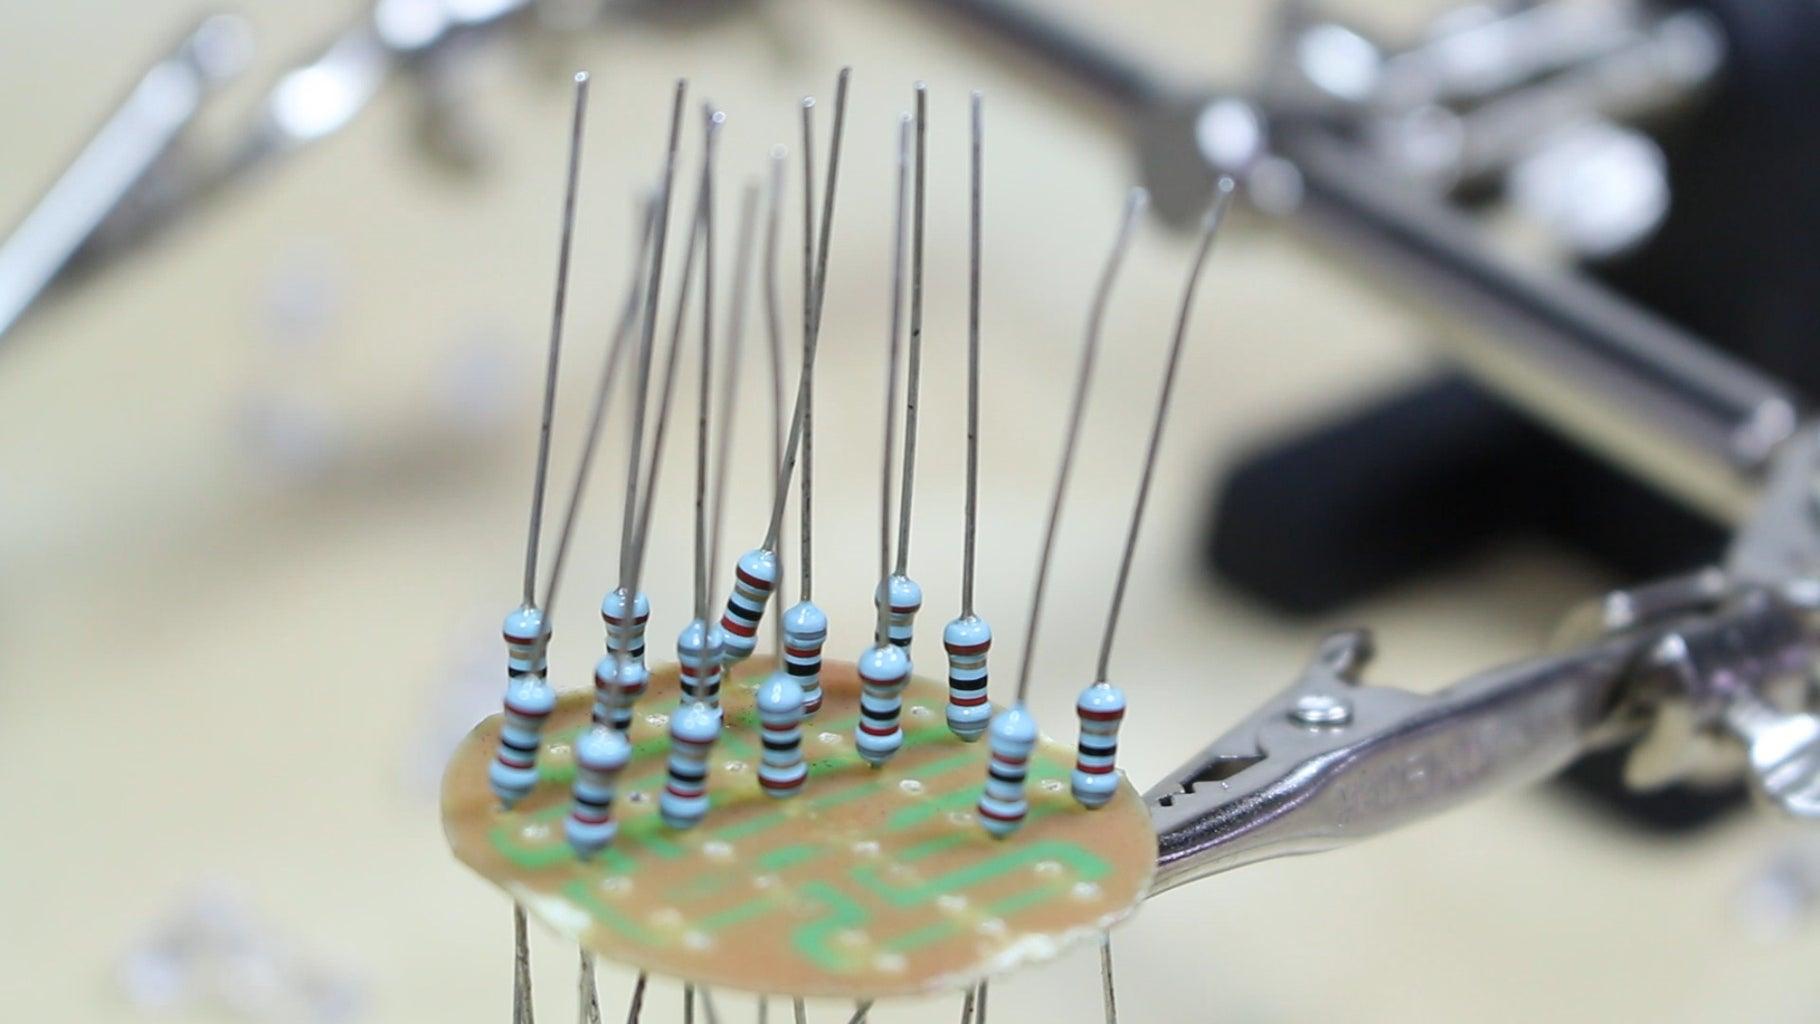 Adding the Resistors